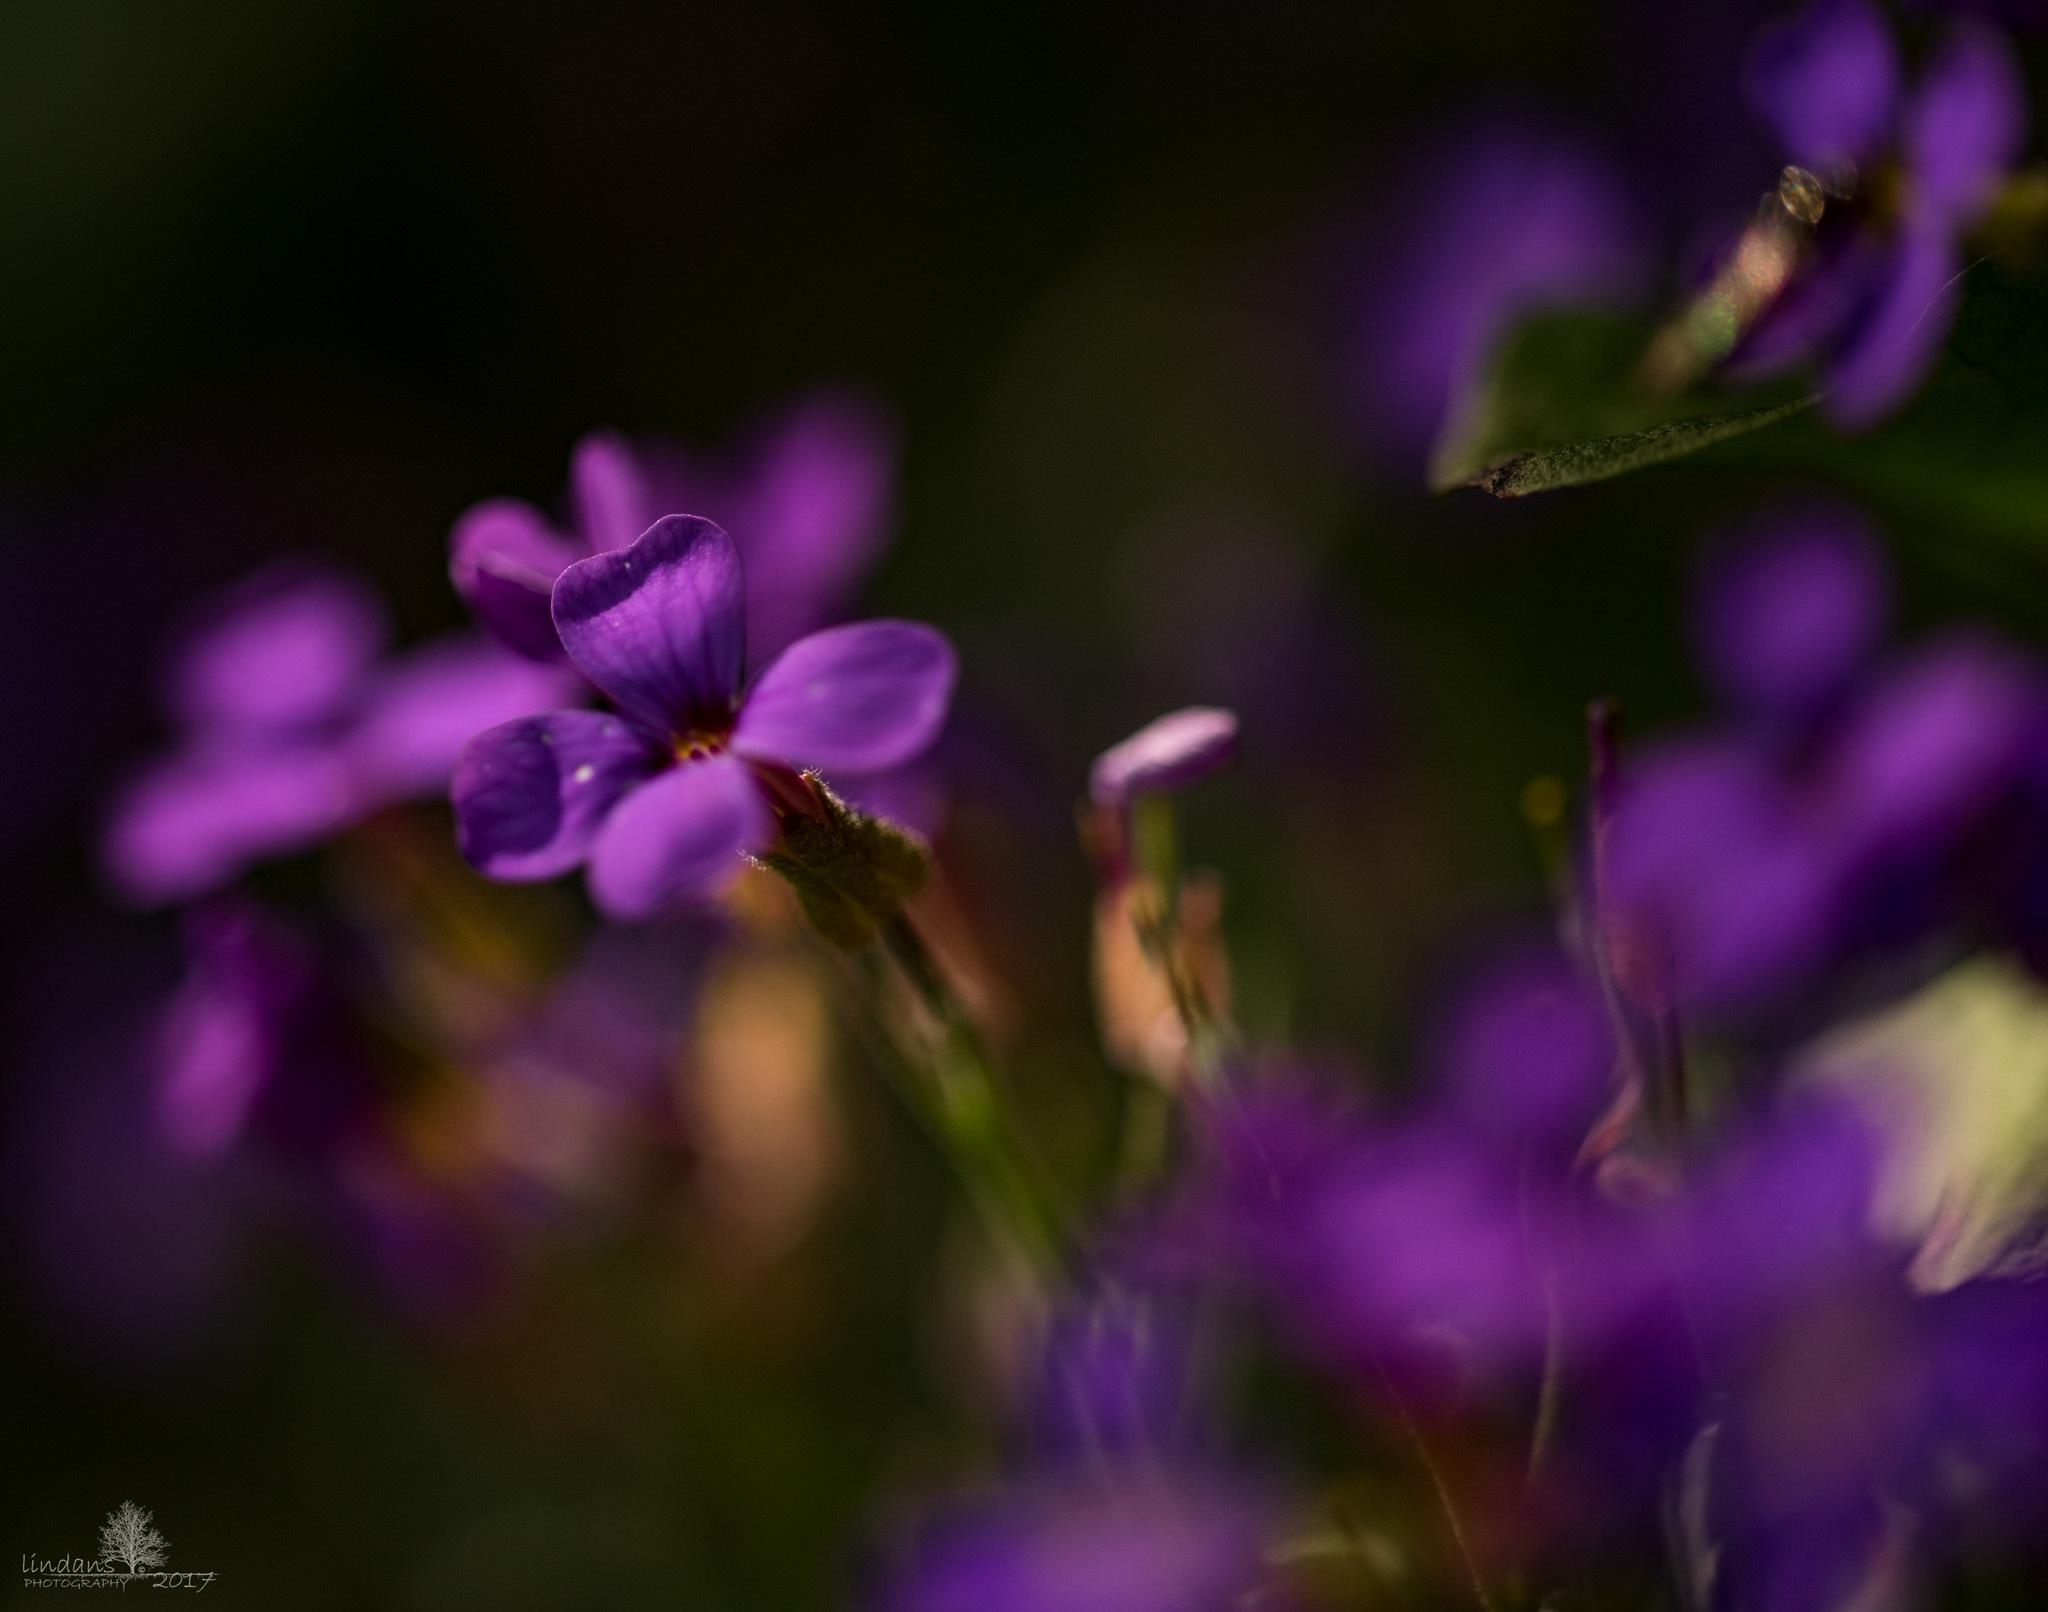 purple by lindans